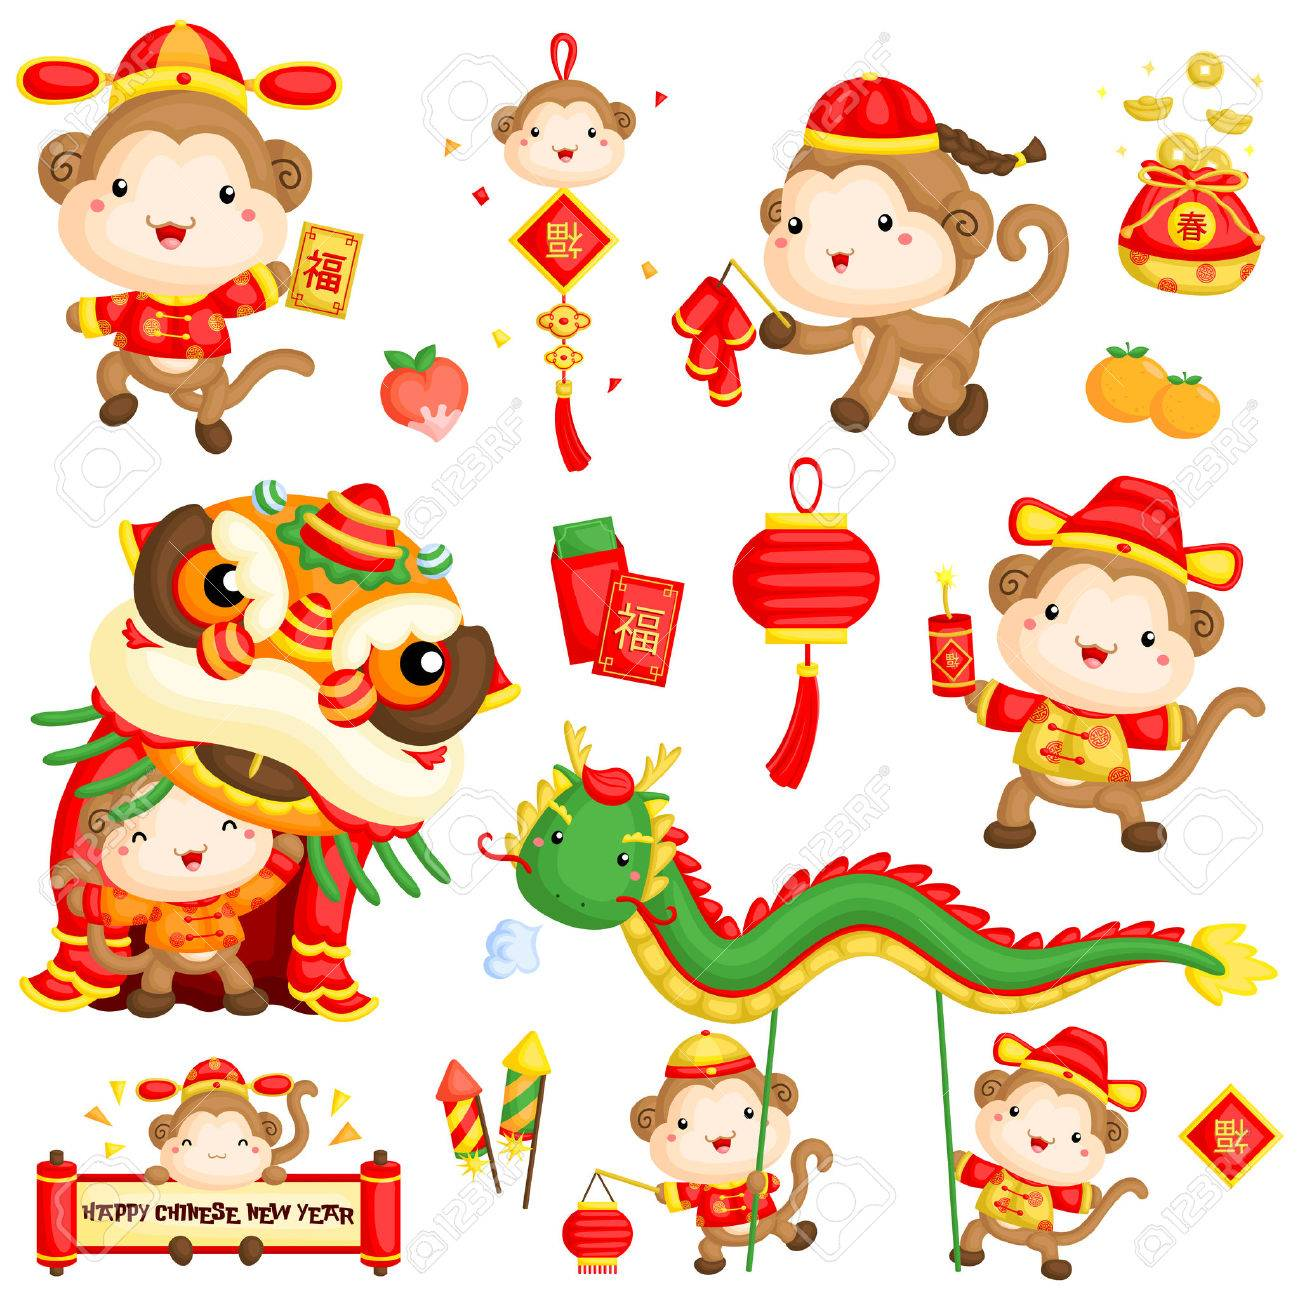 Monkey Year Chinese New Year Vector Set - 50573024